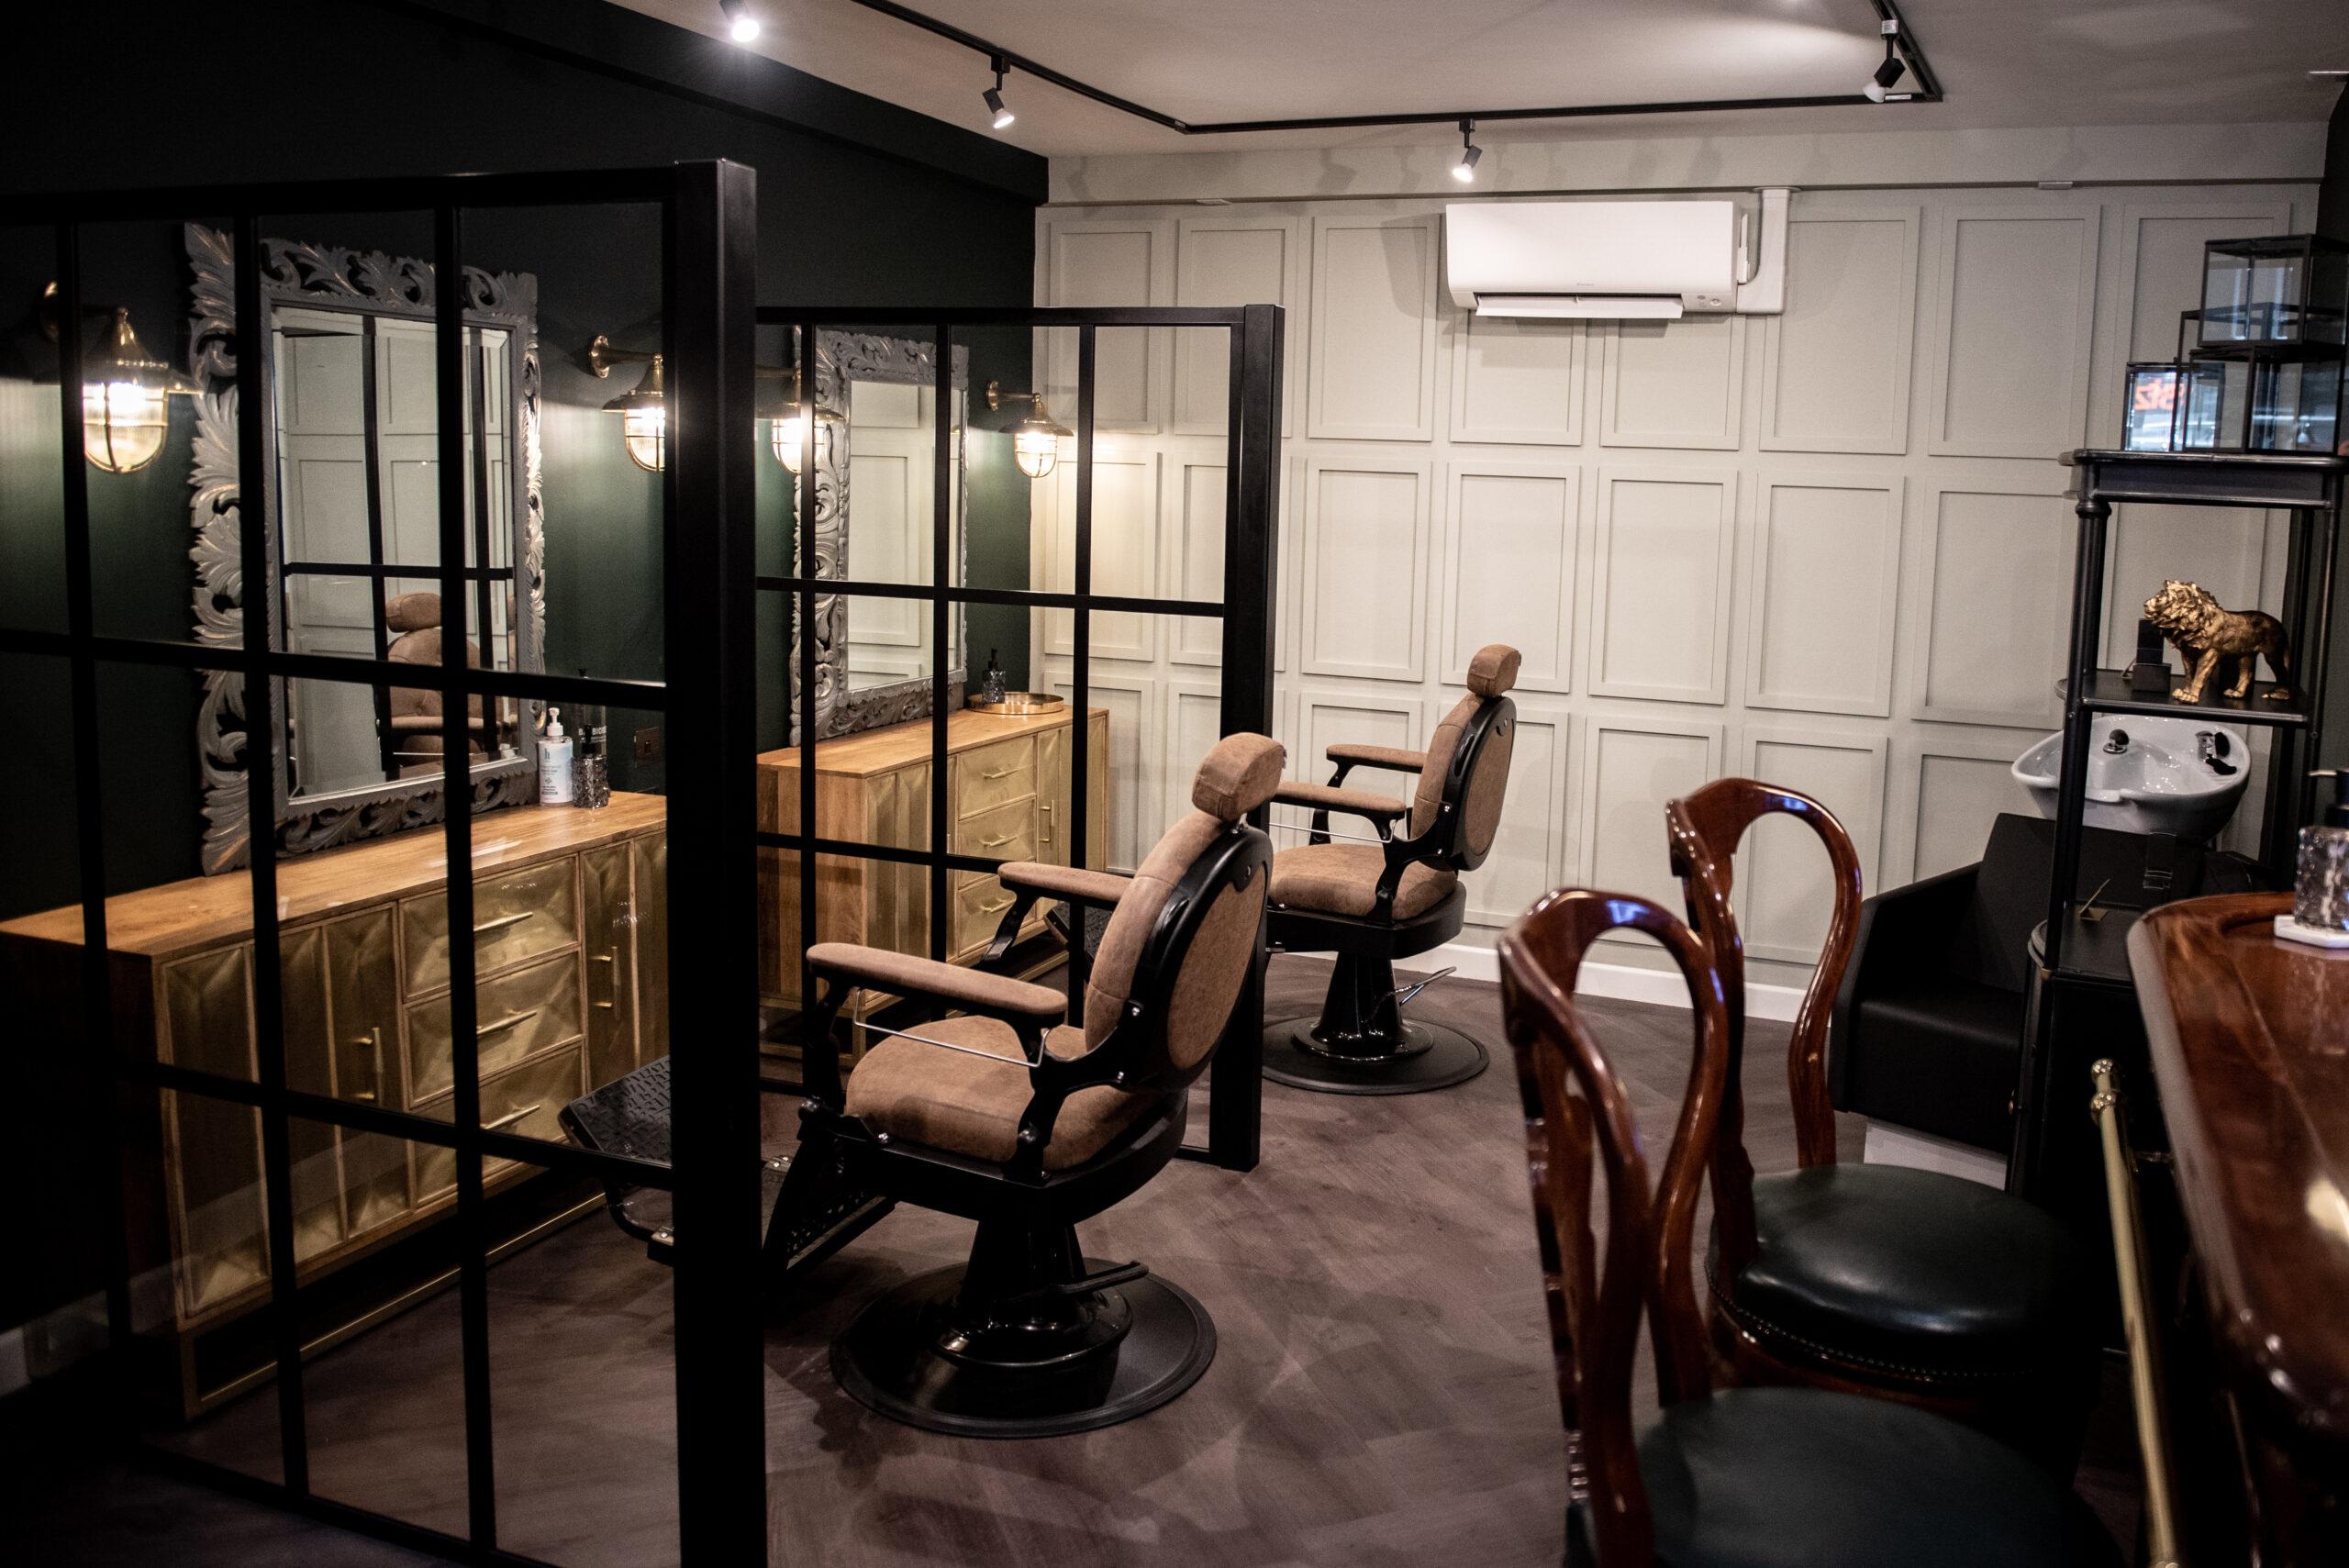 Lions Barbershop